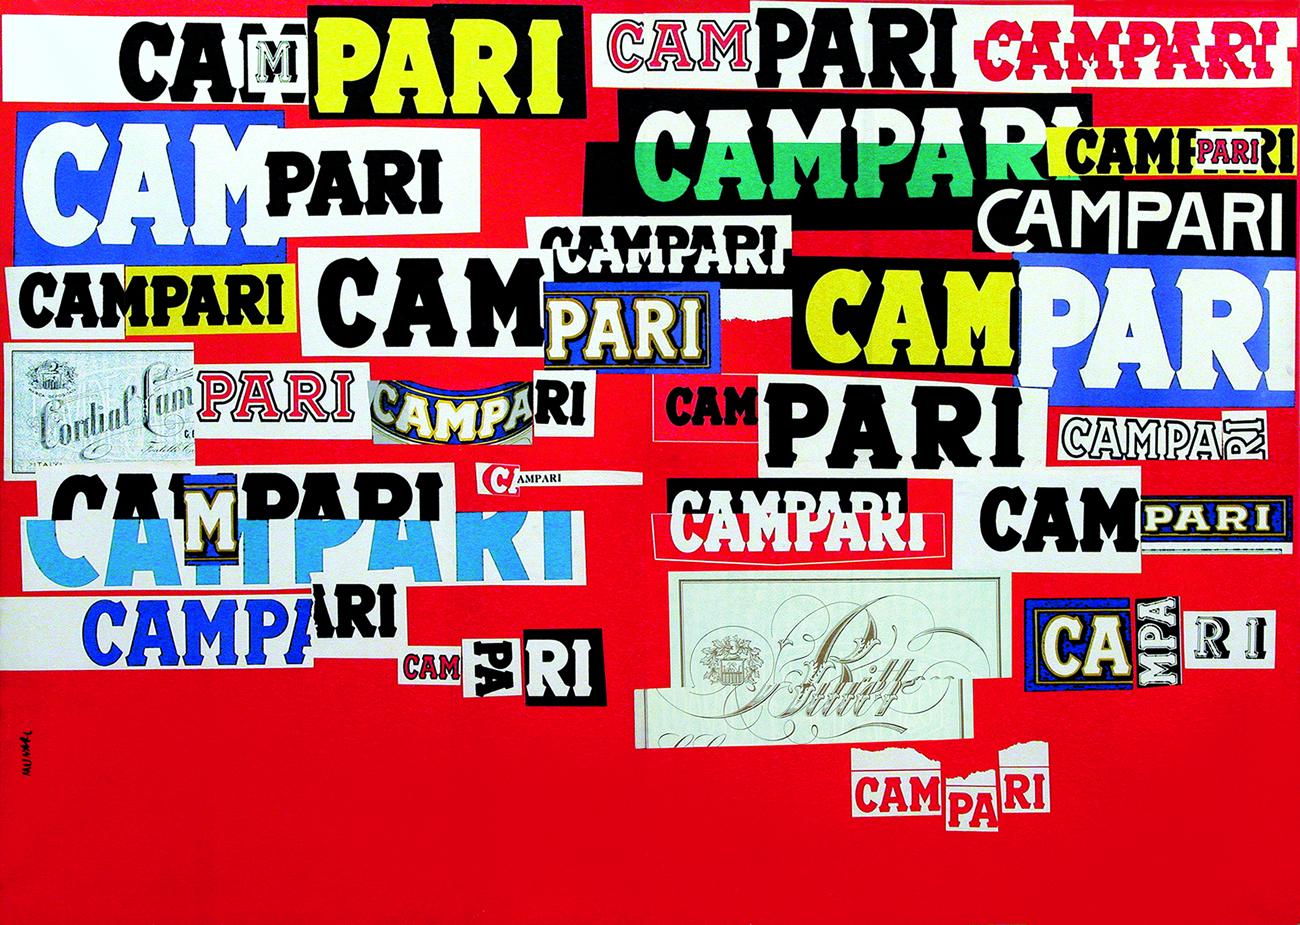 Bruno Munari, Manifesto Campari, 1964